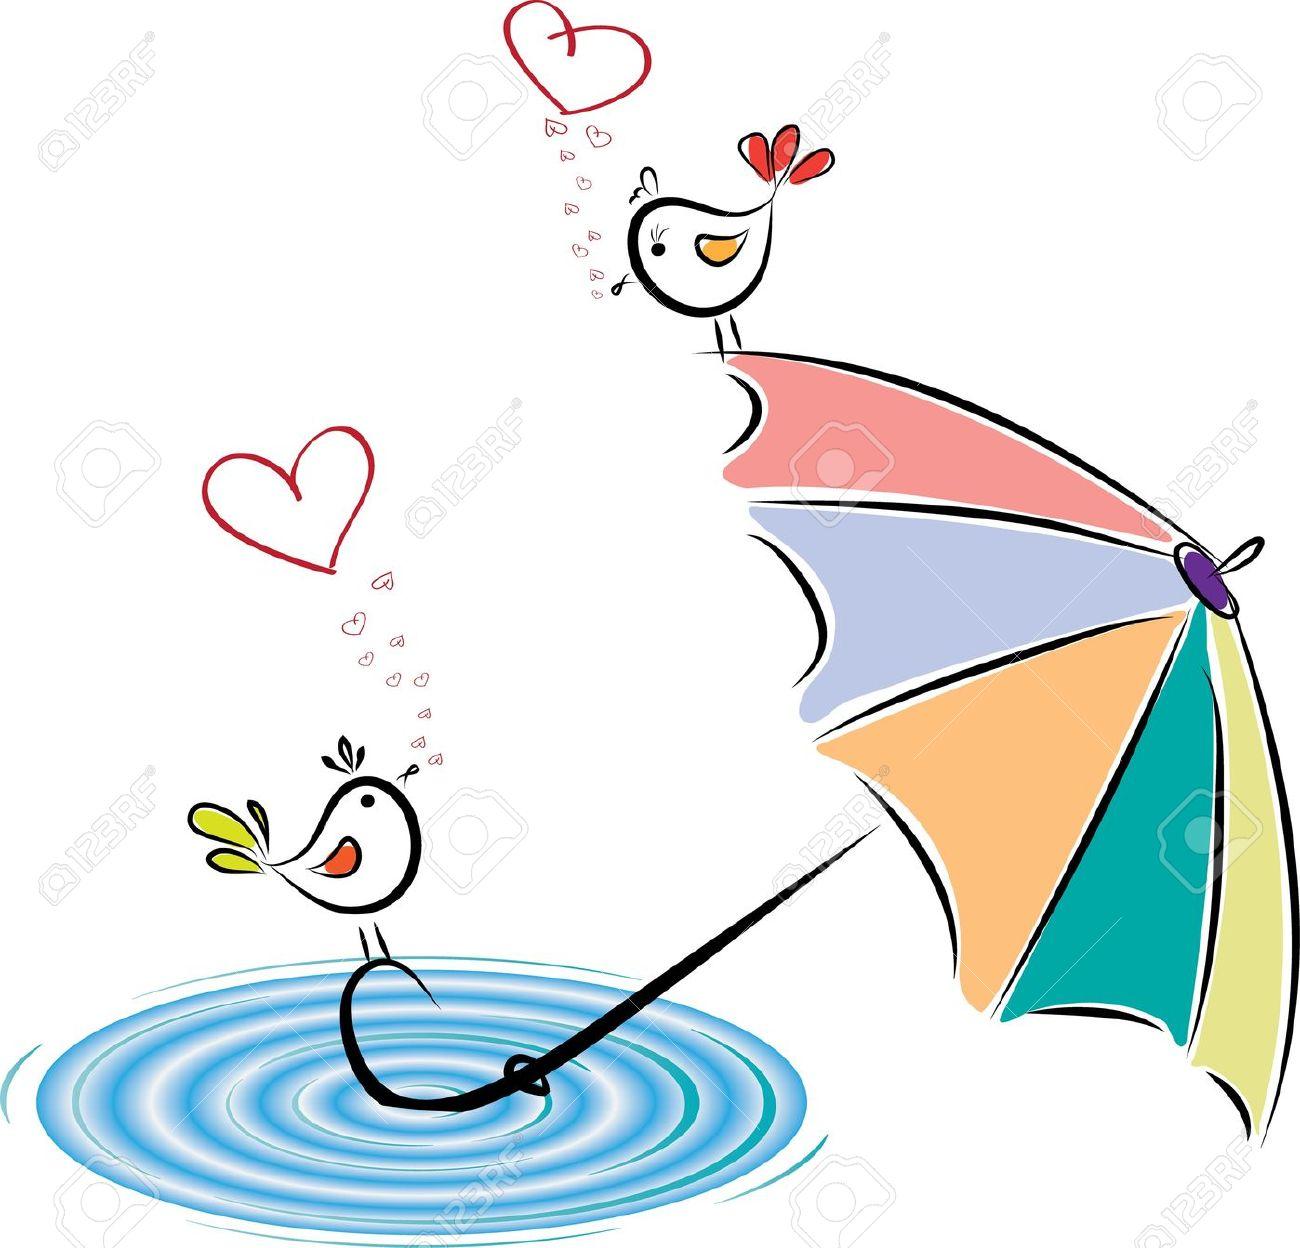 Love rain clipart.